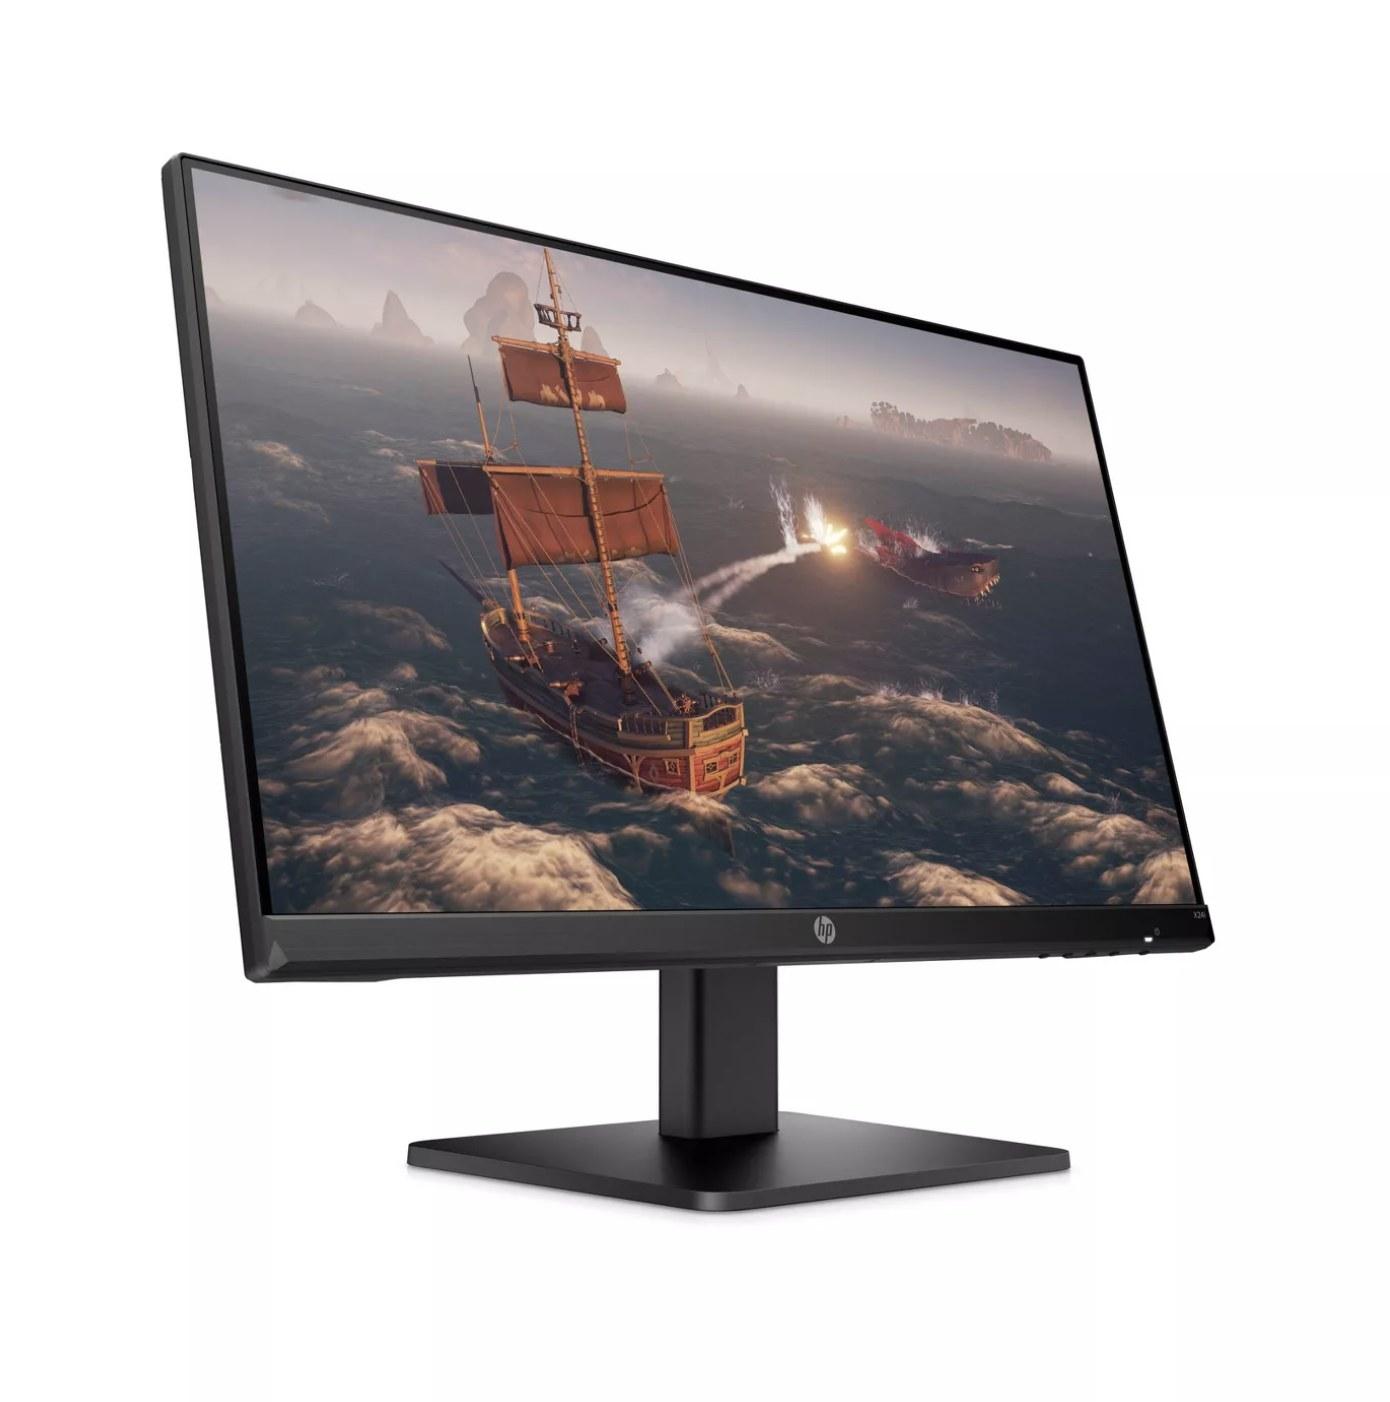 The gaming monitor